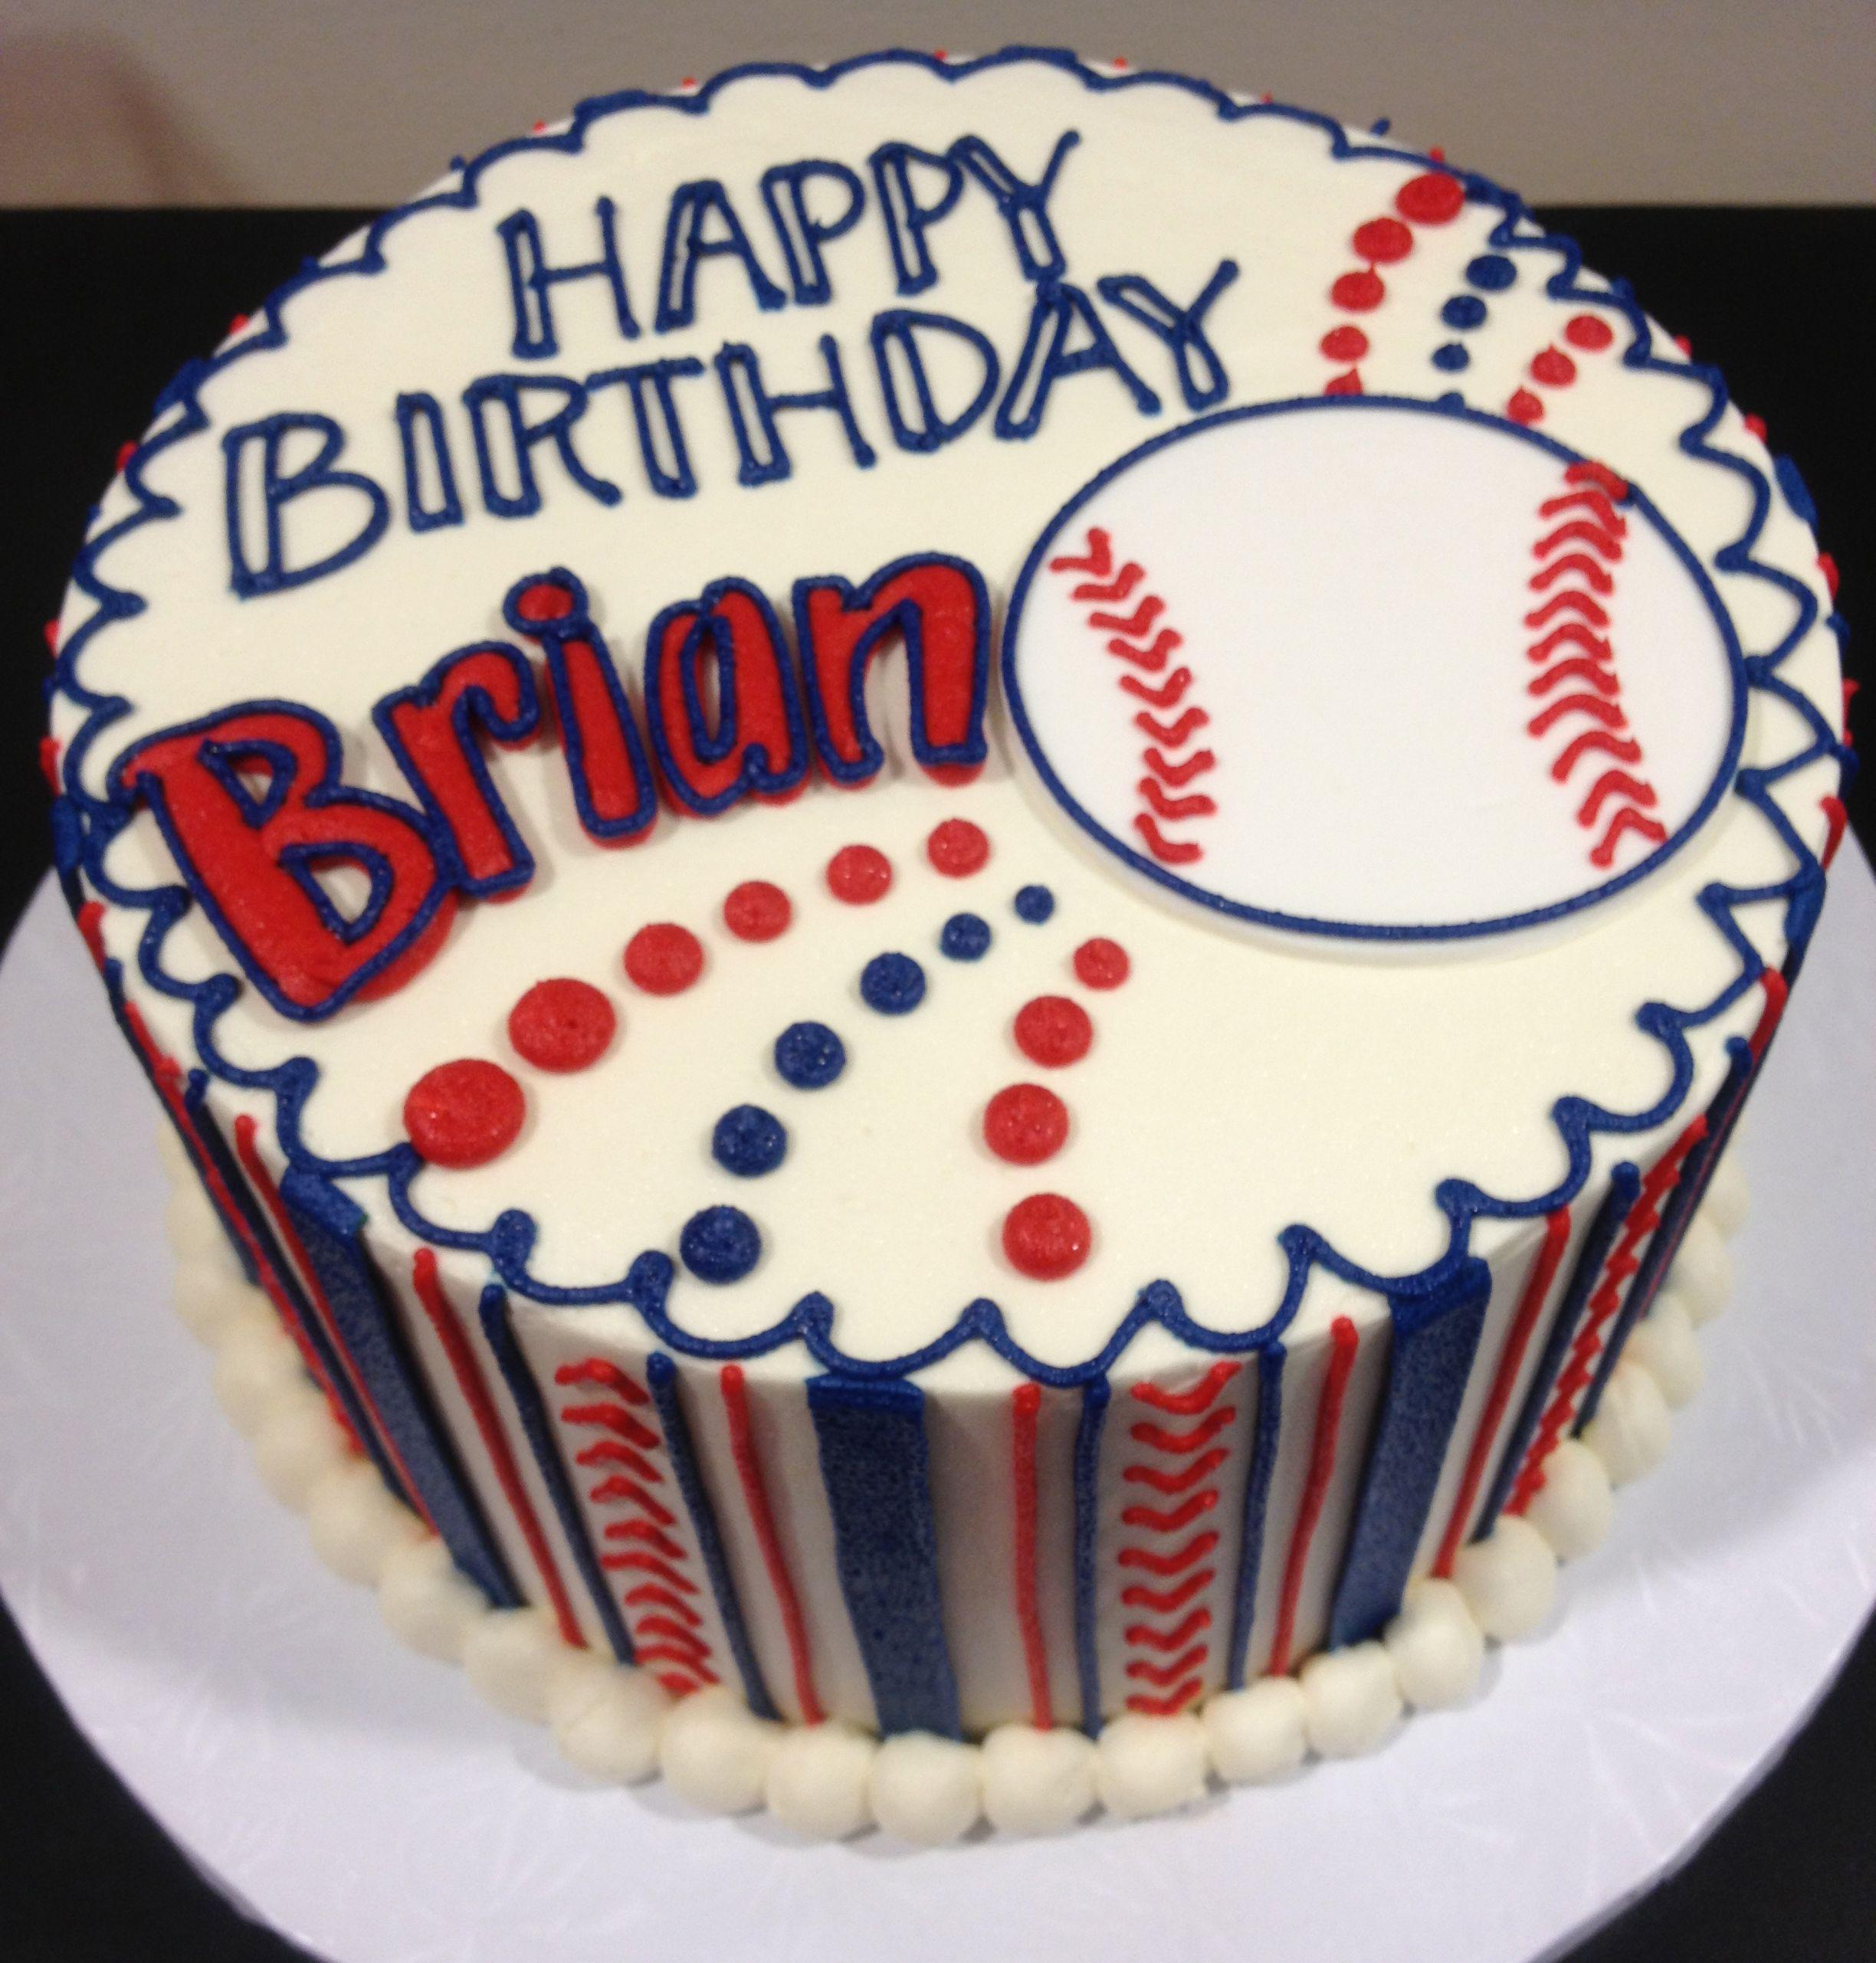 Classic cake collection birthday sheet cakes baseball